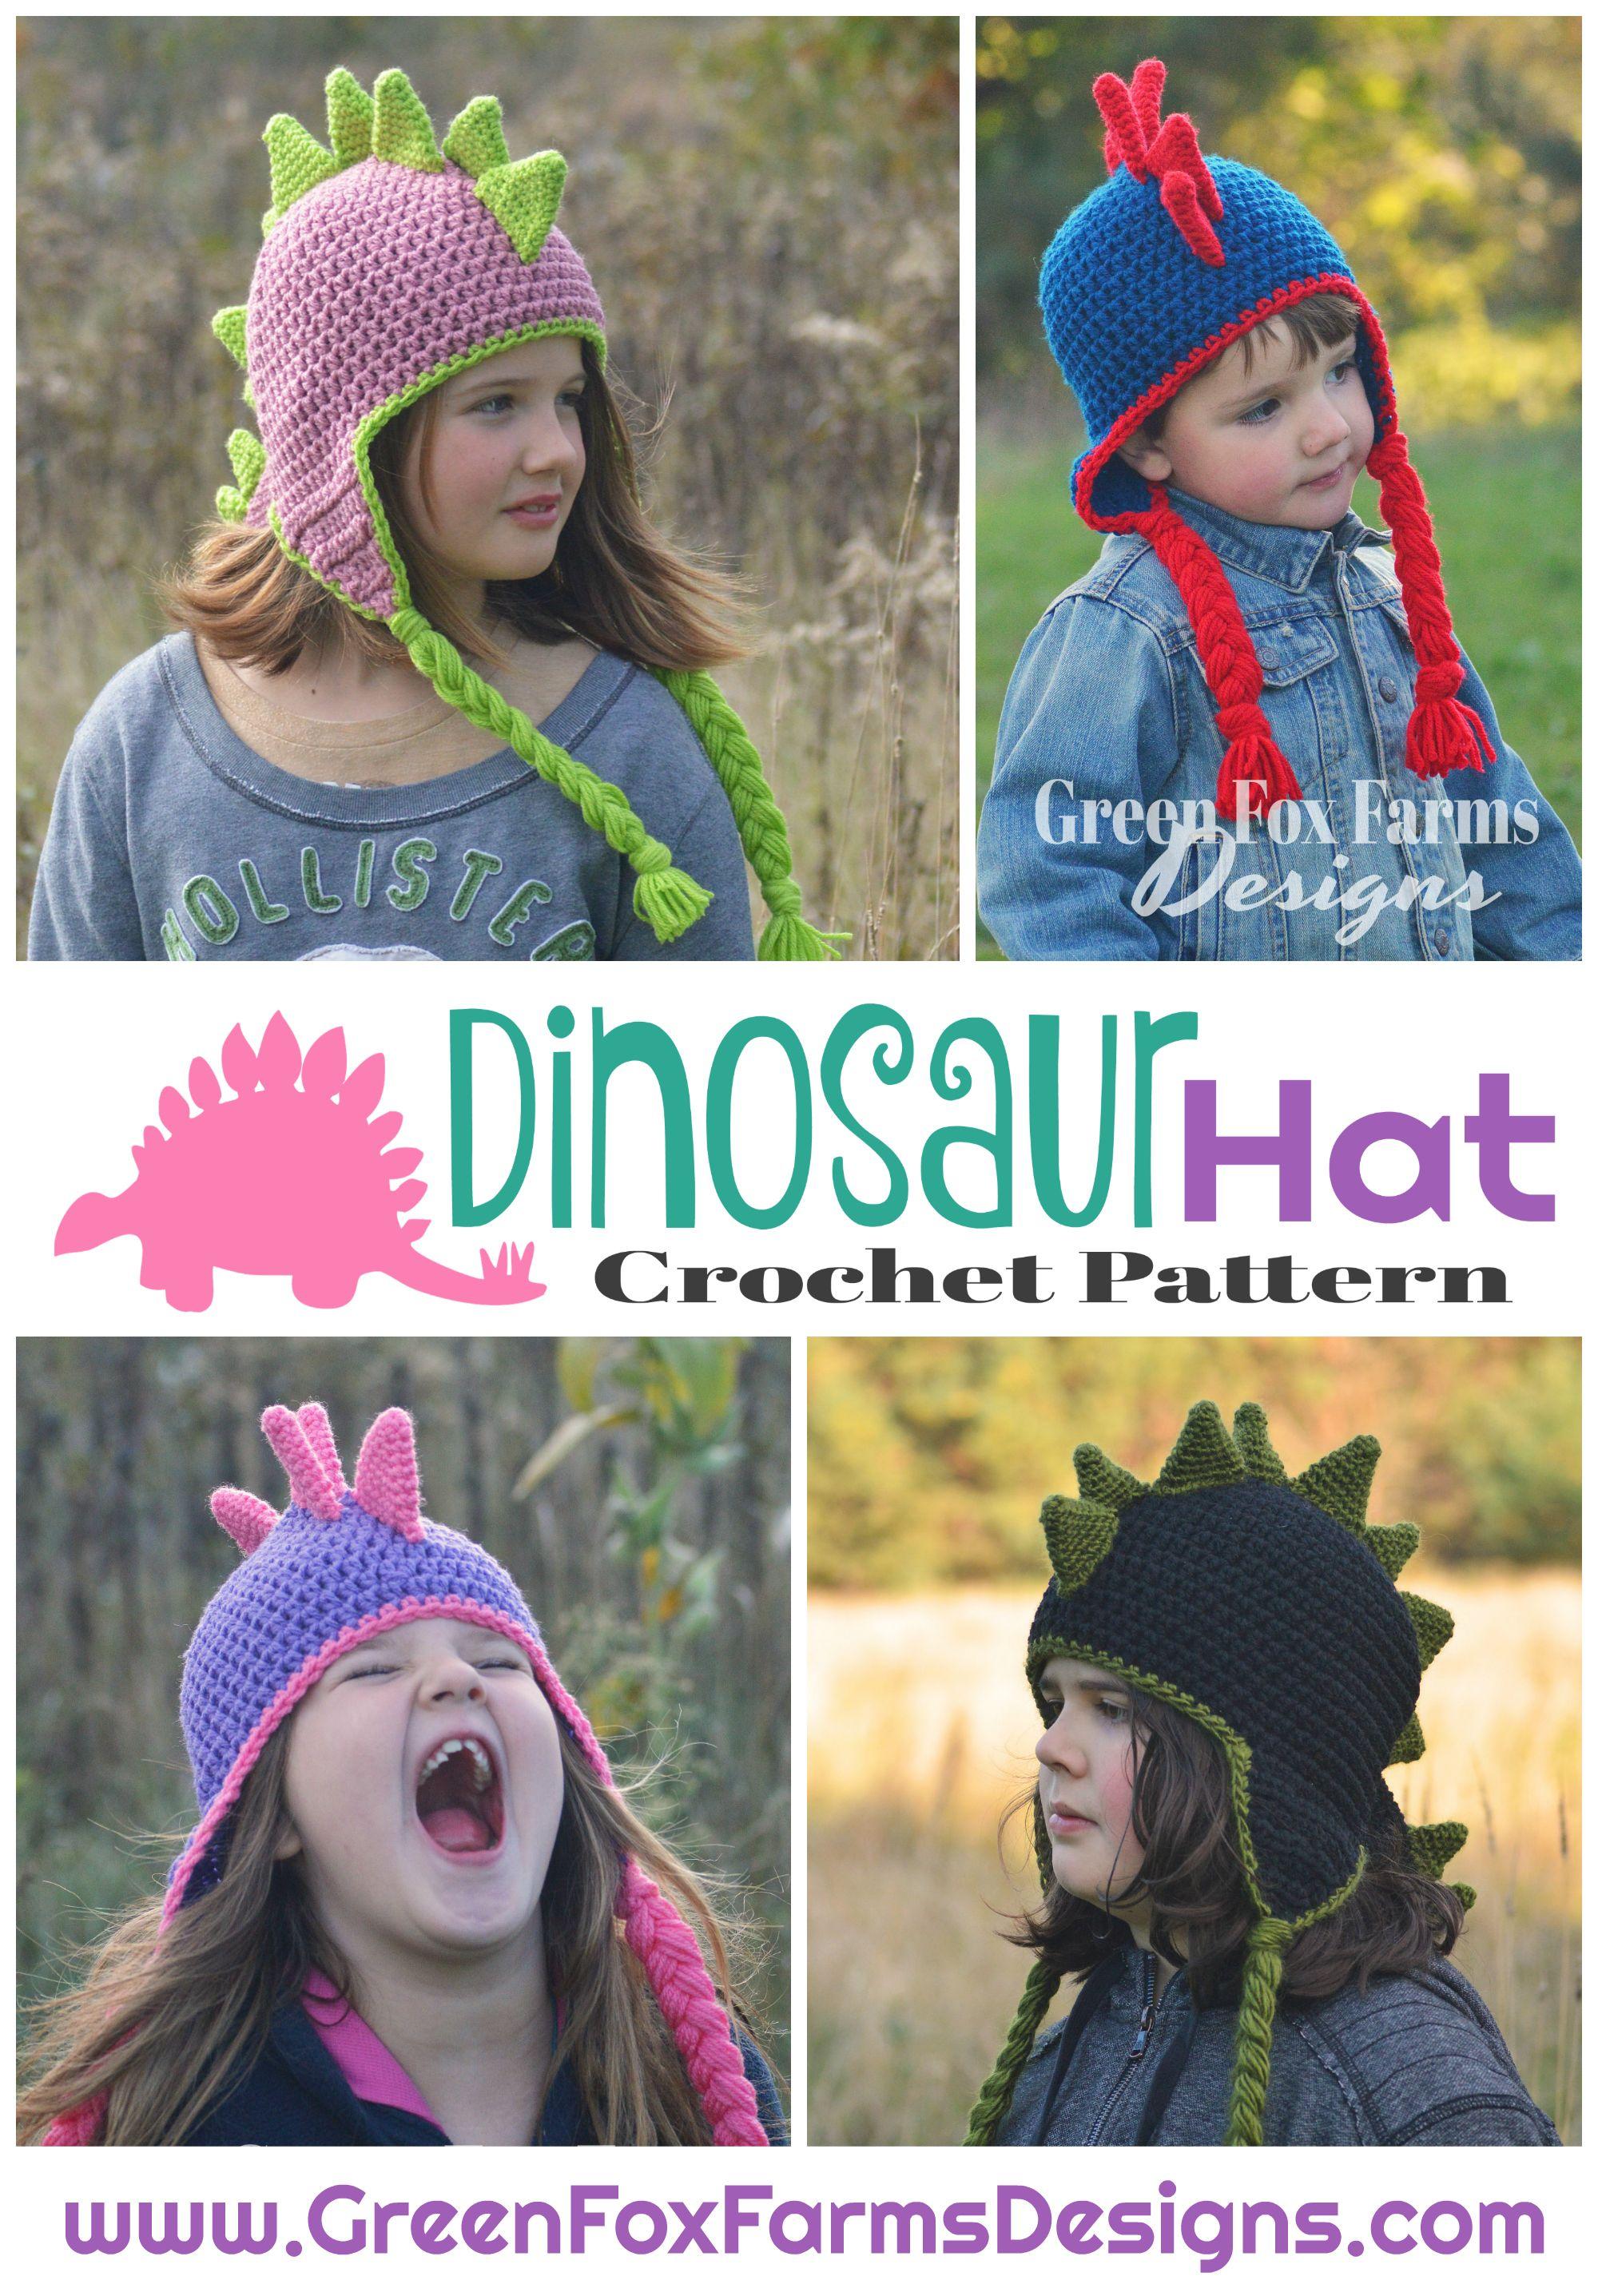 Dinosaur Hat - New Pattern Release and SALE | Pinterest | Dinosaur ...